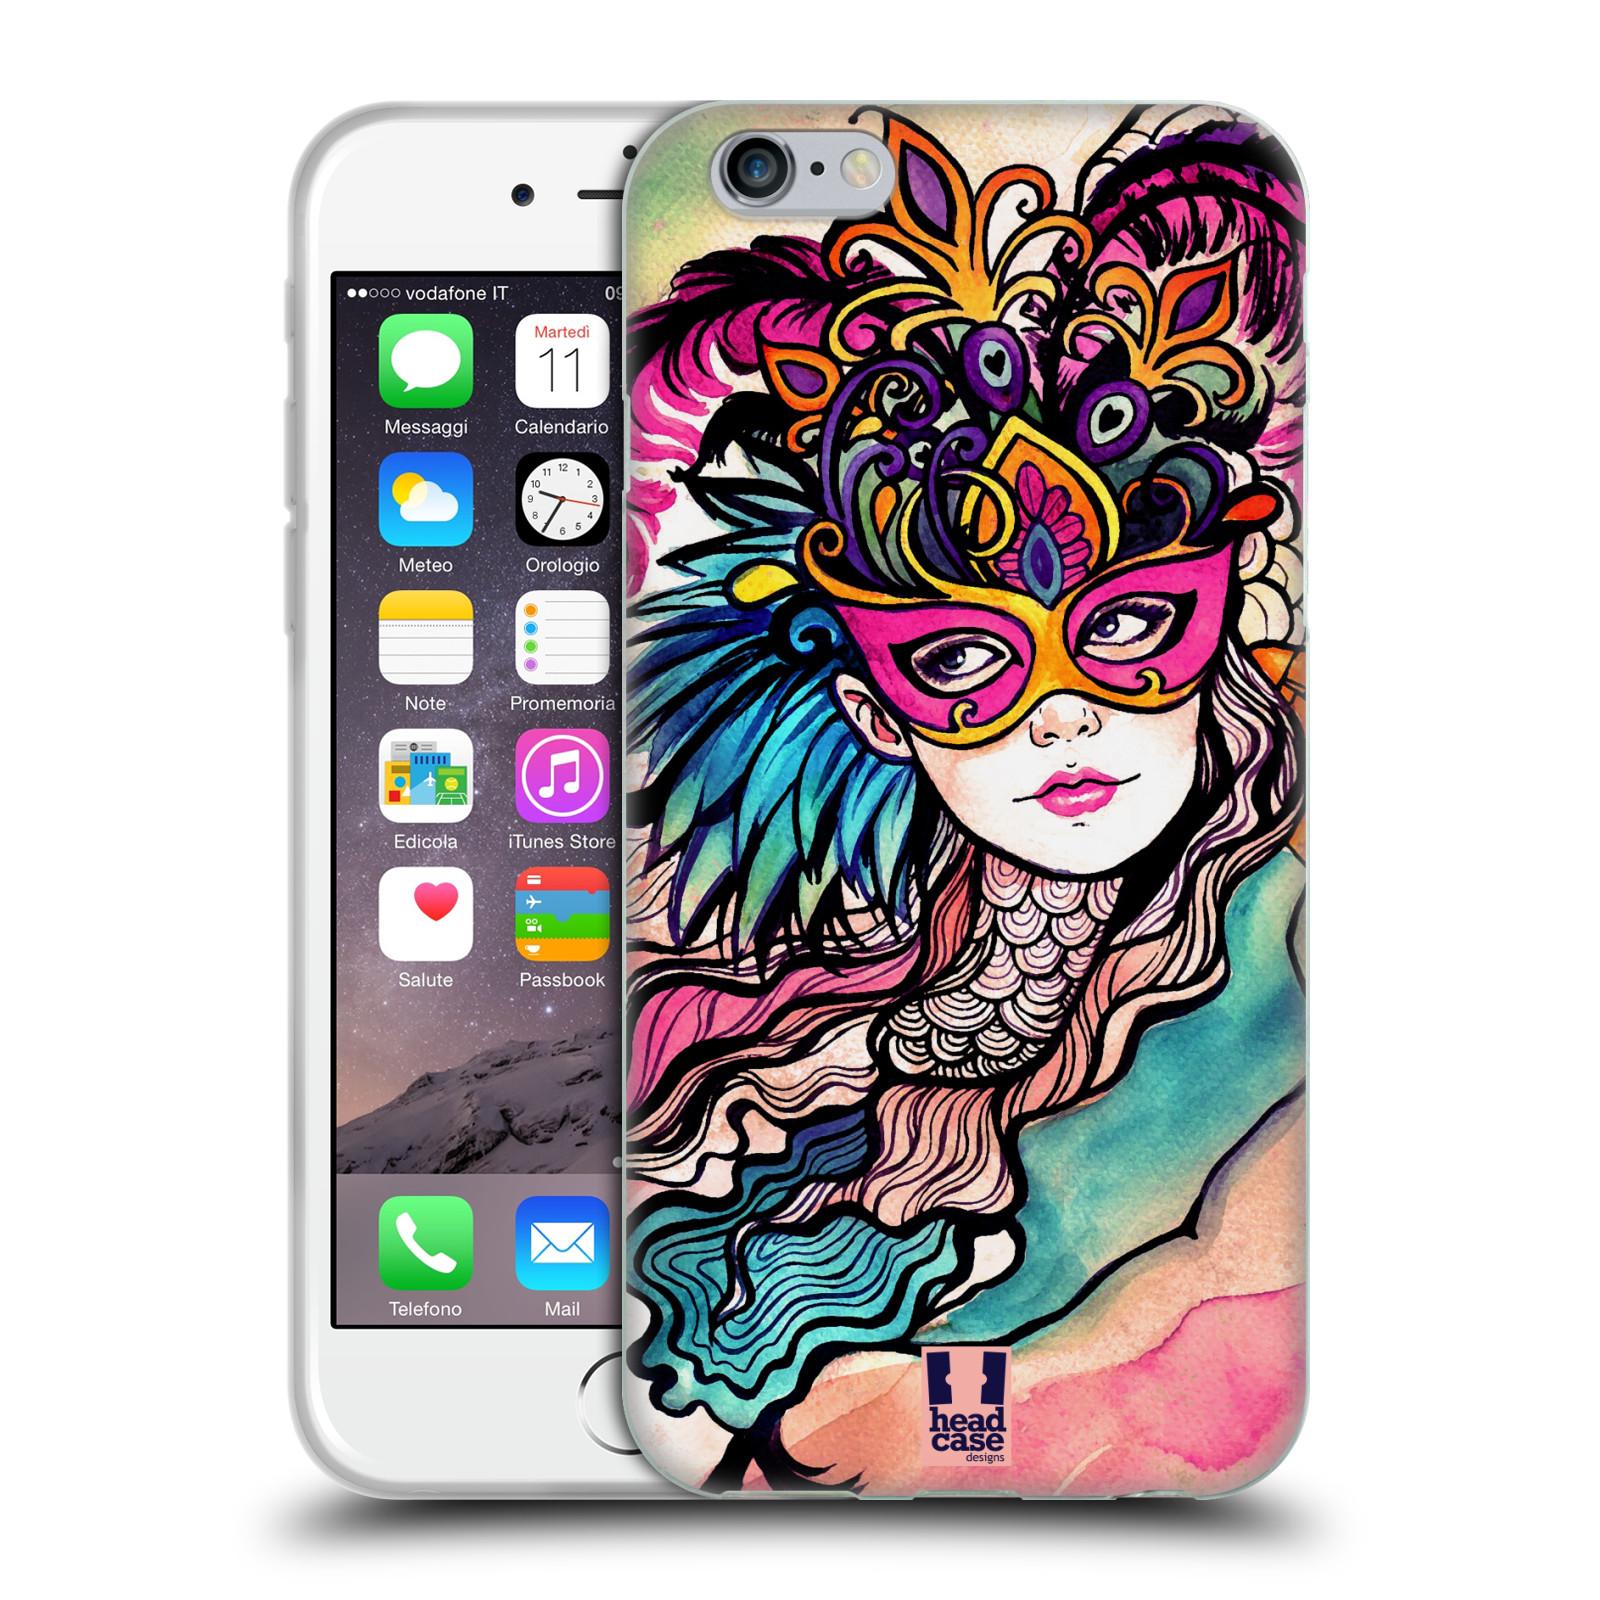 HEAD CASE silikonový obal na mobil Apple Iphone 6/6S vzor Maškarní ples masky kreslené vzory růžová